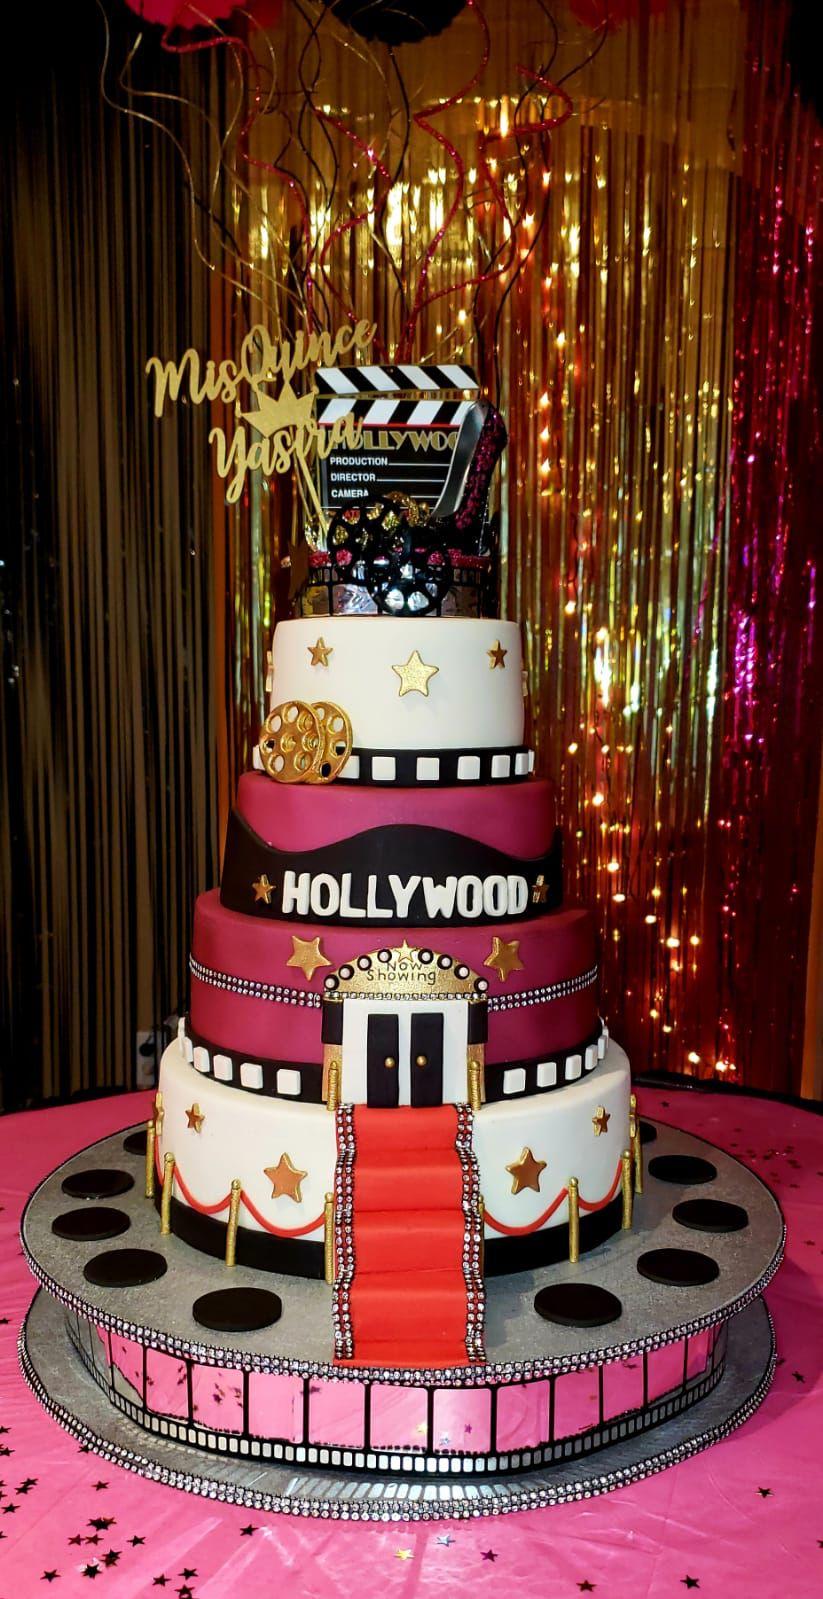 Incredible Liz Custom Cakes Facebook Com Lizcustomcakes Apopka Fl 407 Funny Birthday Cards Online Alyptdamsfinfo